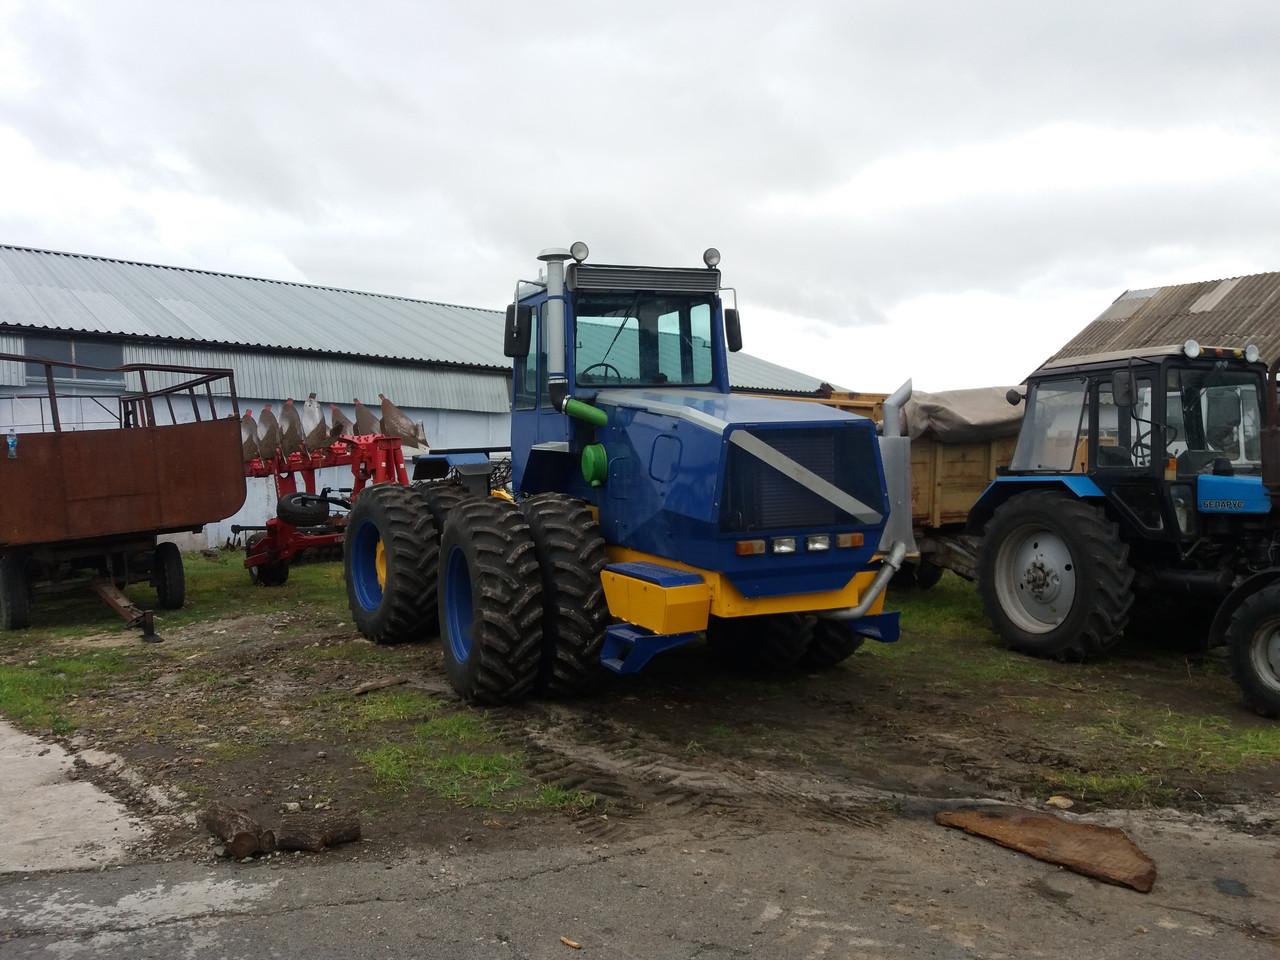 Трактор АТК типа Т-150К (Двигатель Volvo 350 л.с)